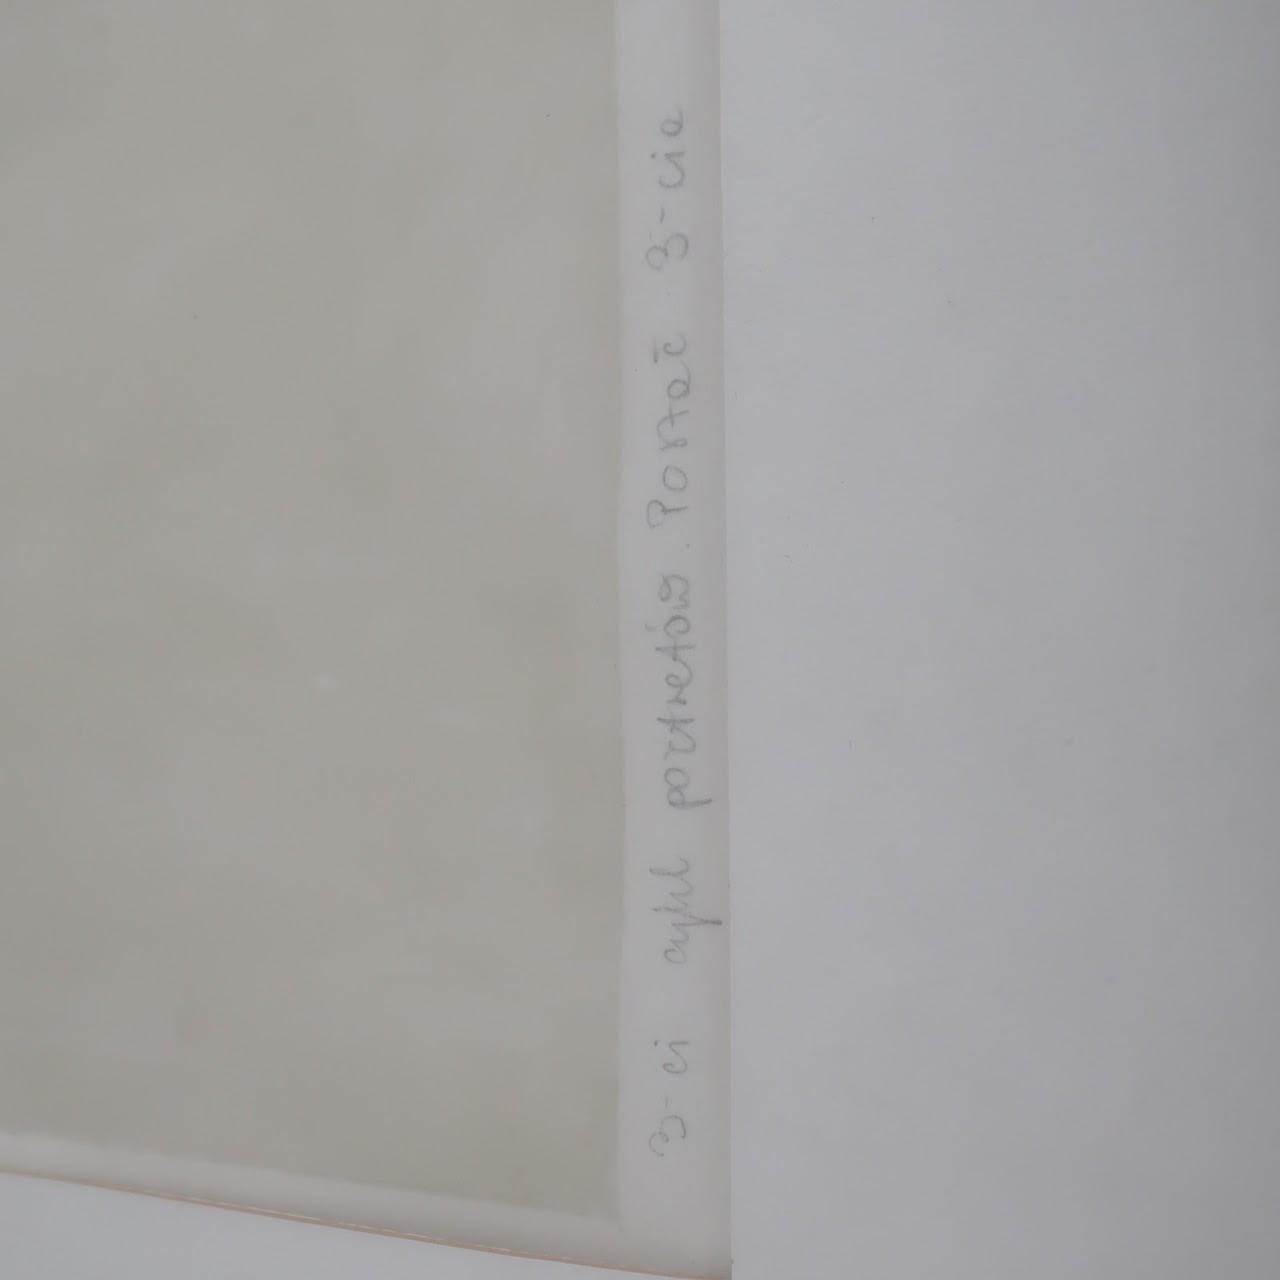 Signed Lithographic Portrait 3